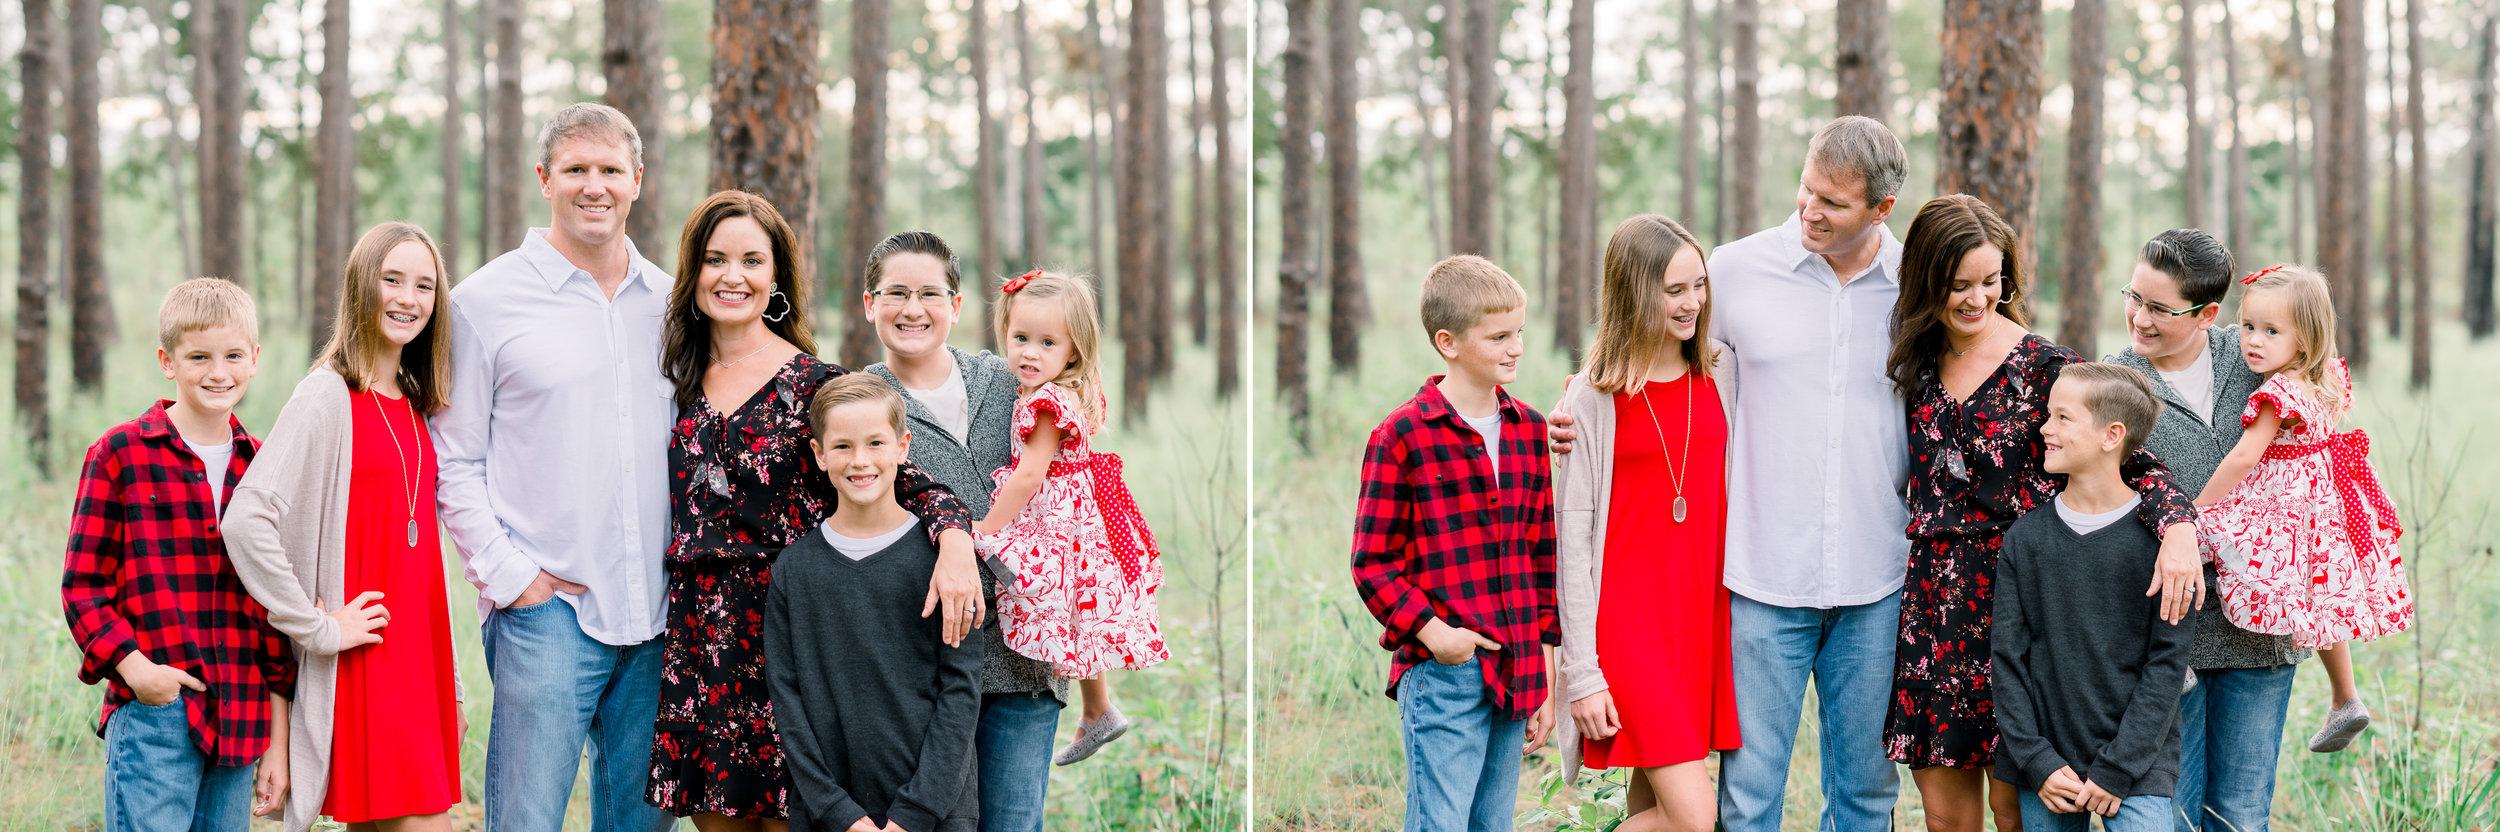 KateTaramykinStudios-Wekiva-Springs-Family-Photographer-Donald-4.jpg